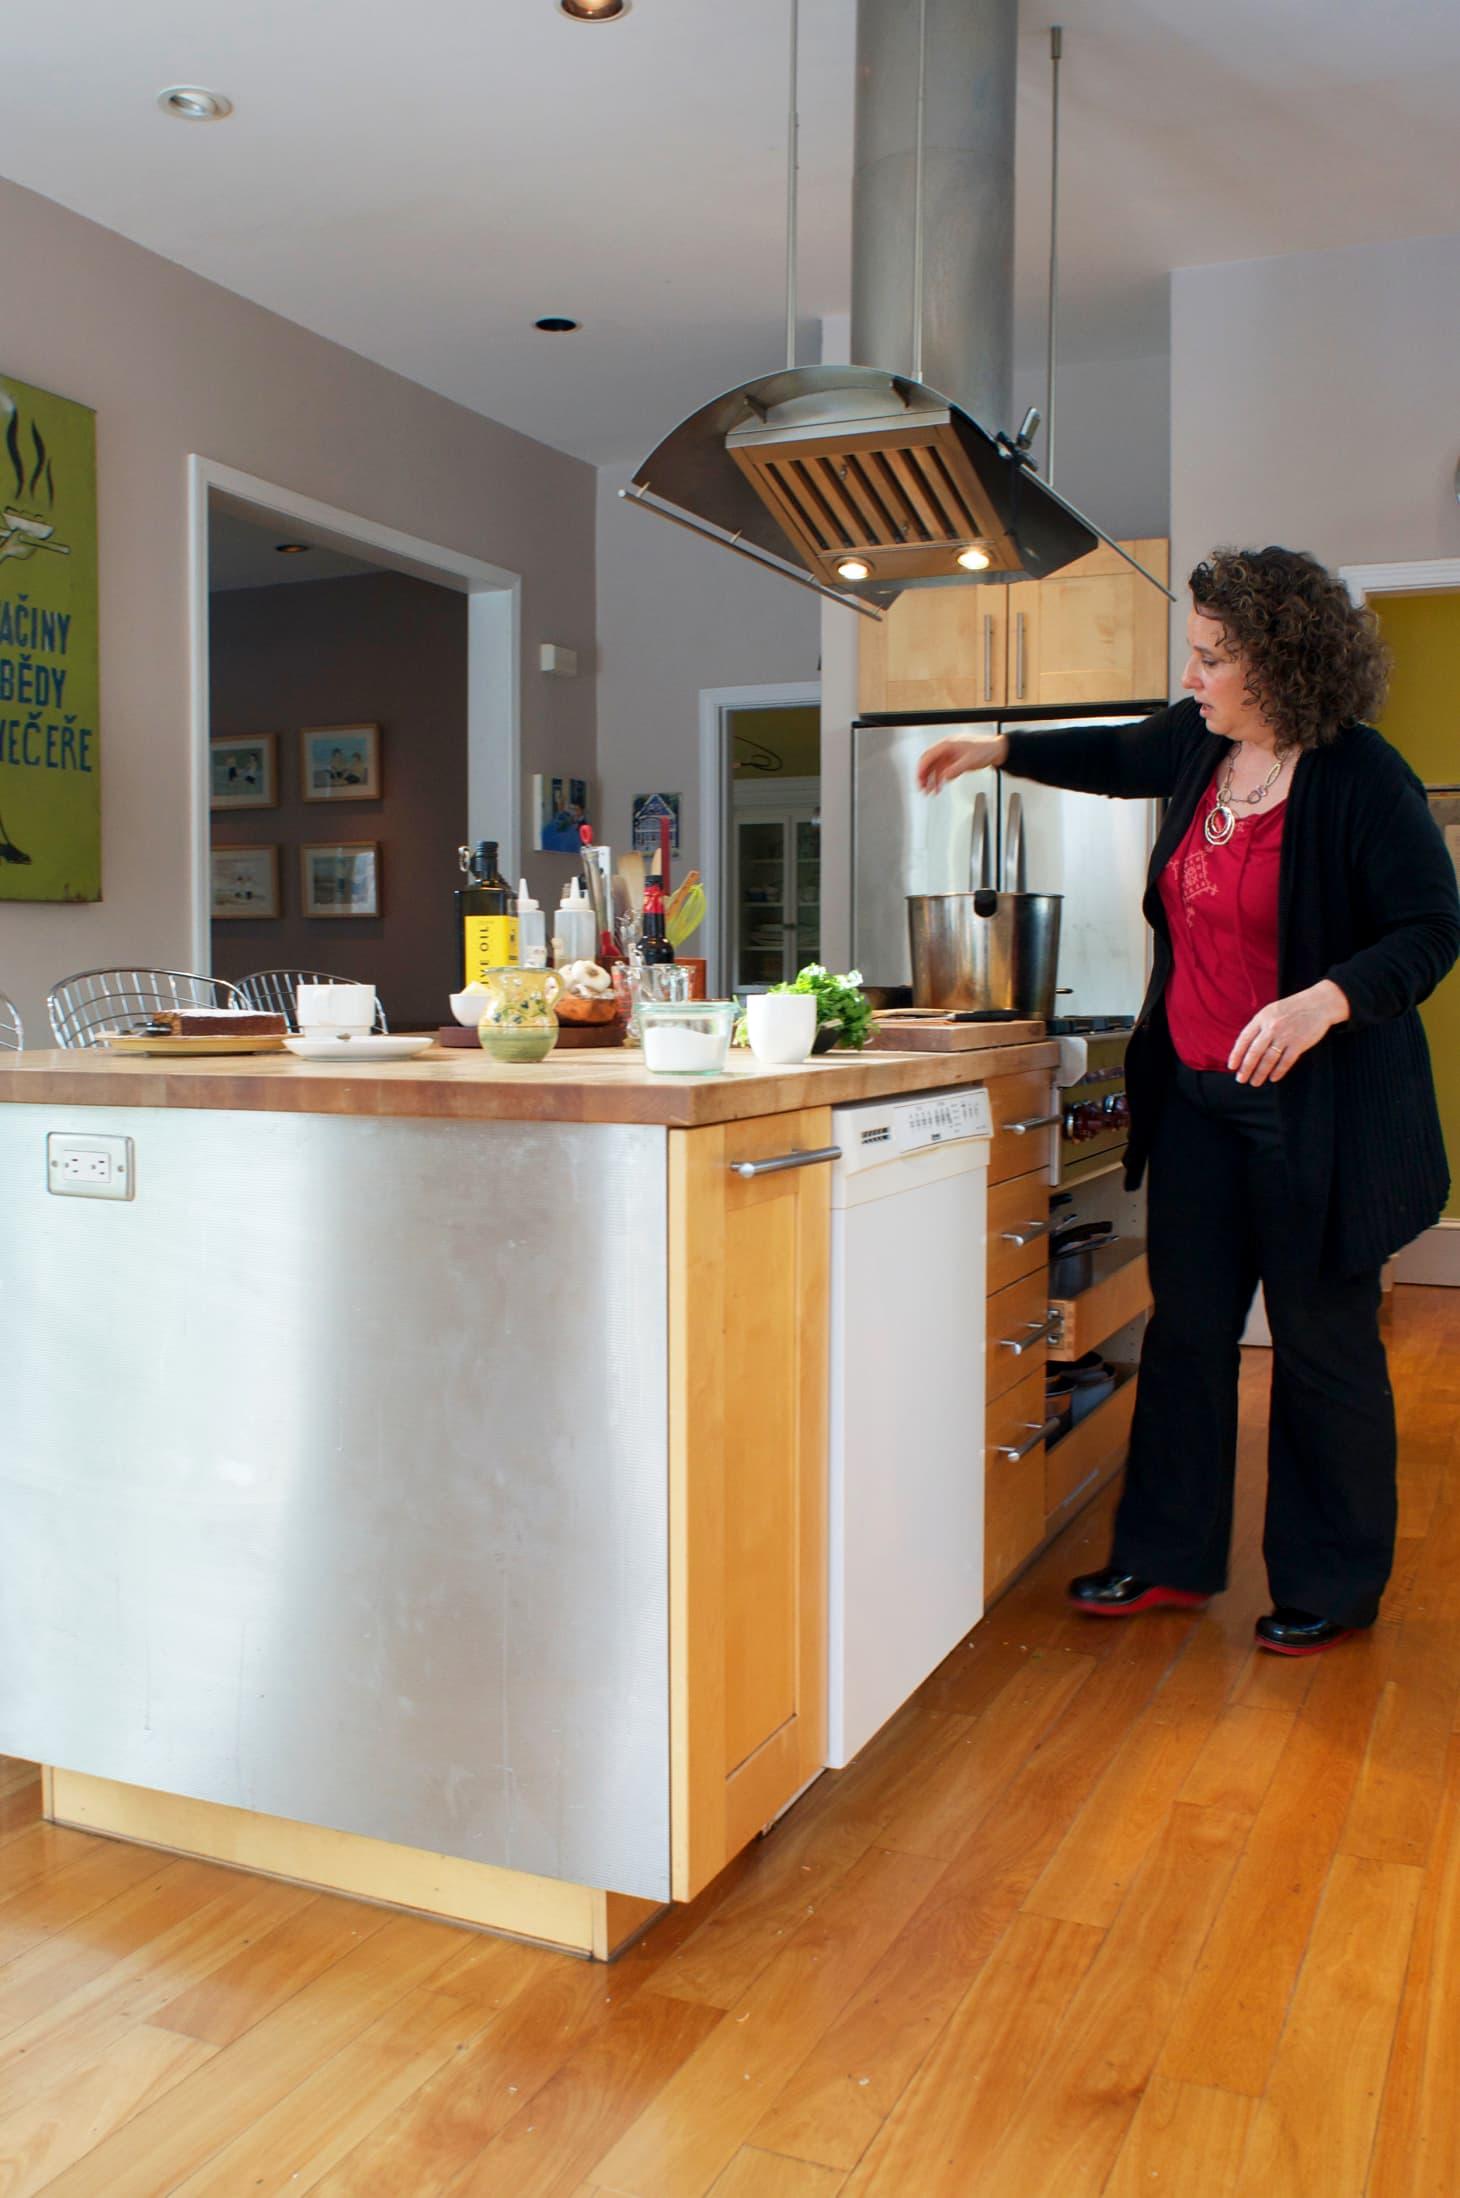 Cook's Country Editor Eva Katz's Homey, Hardworking Kitchen